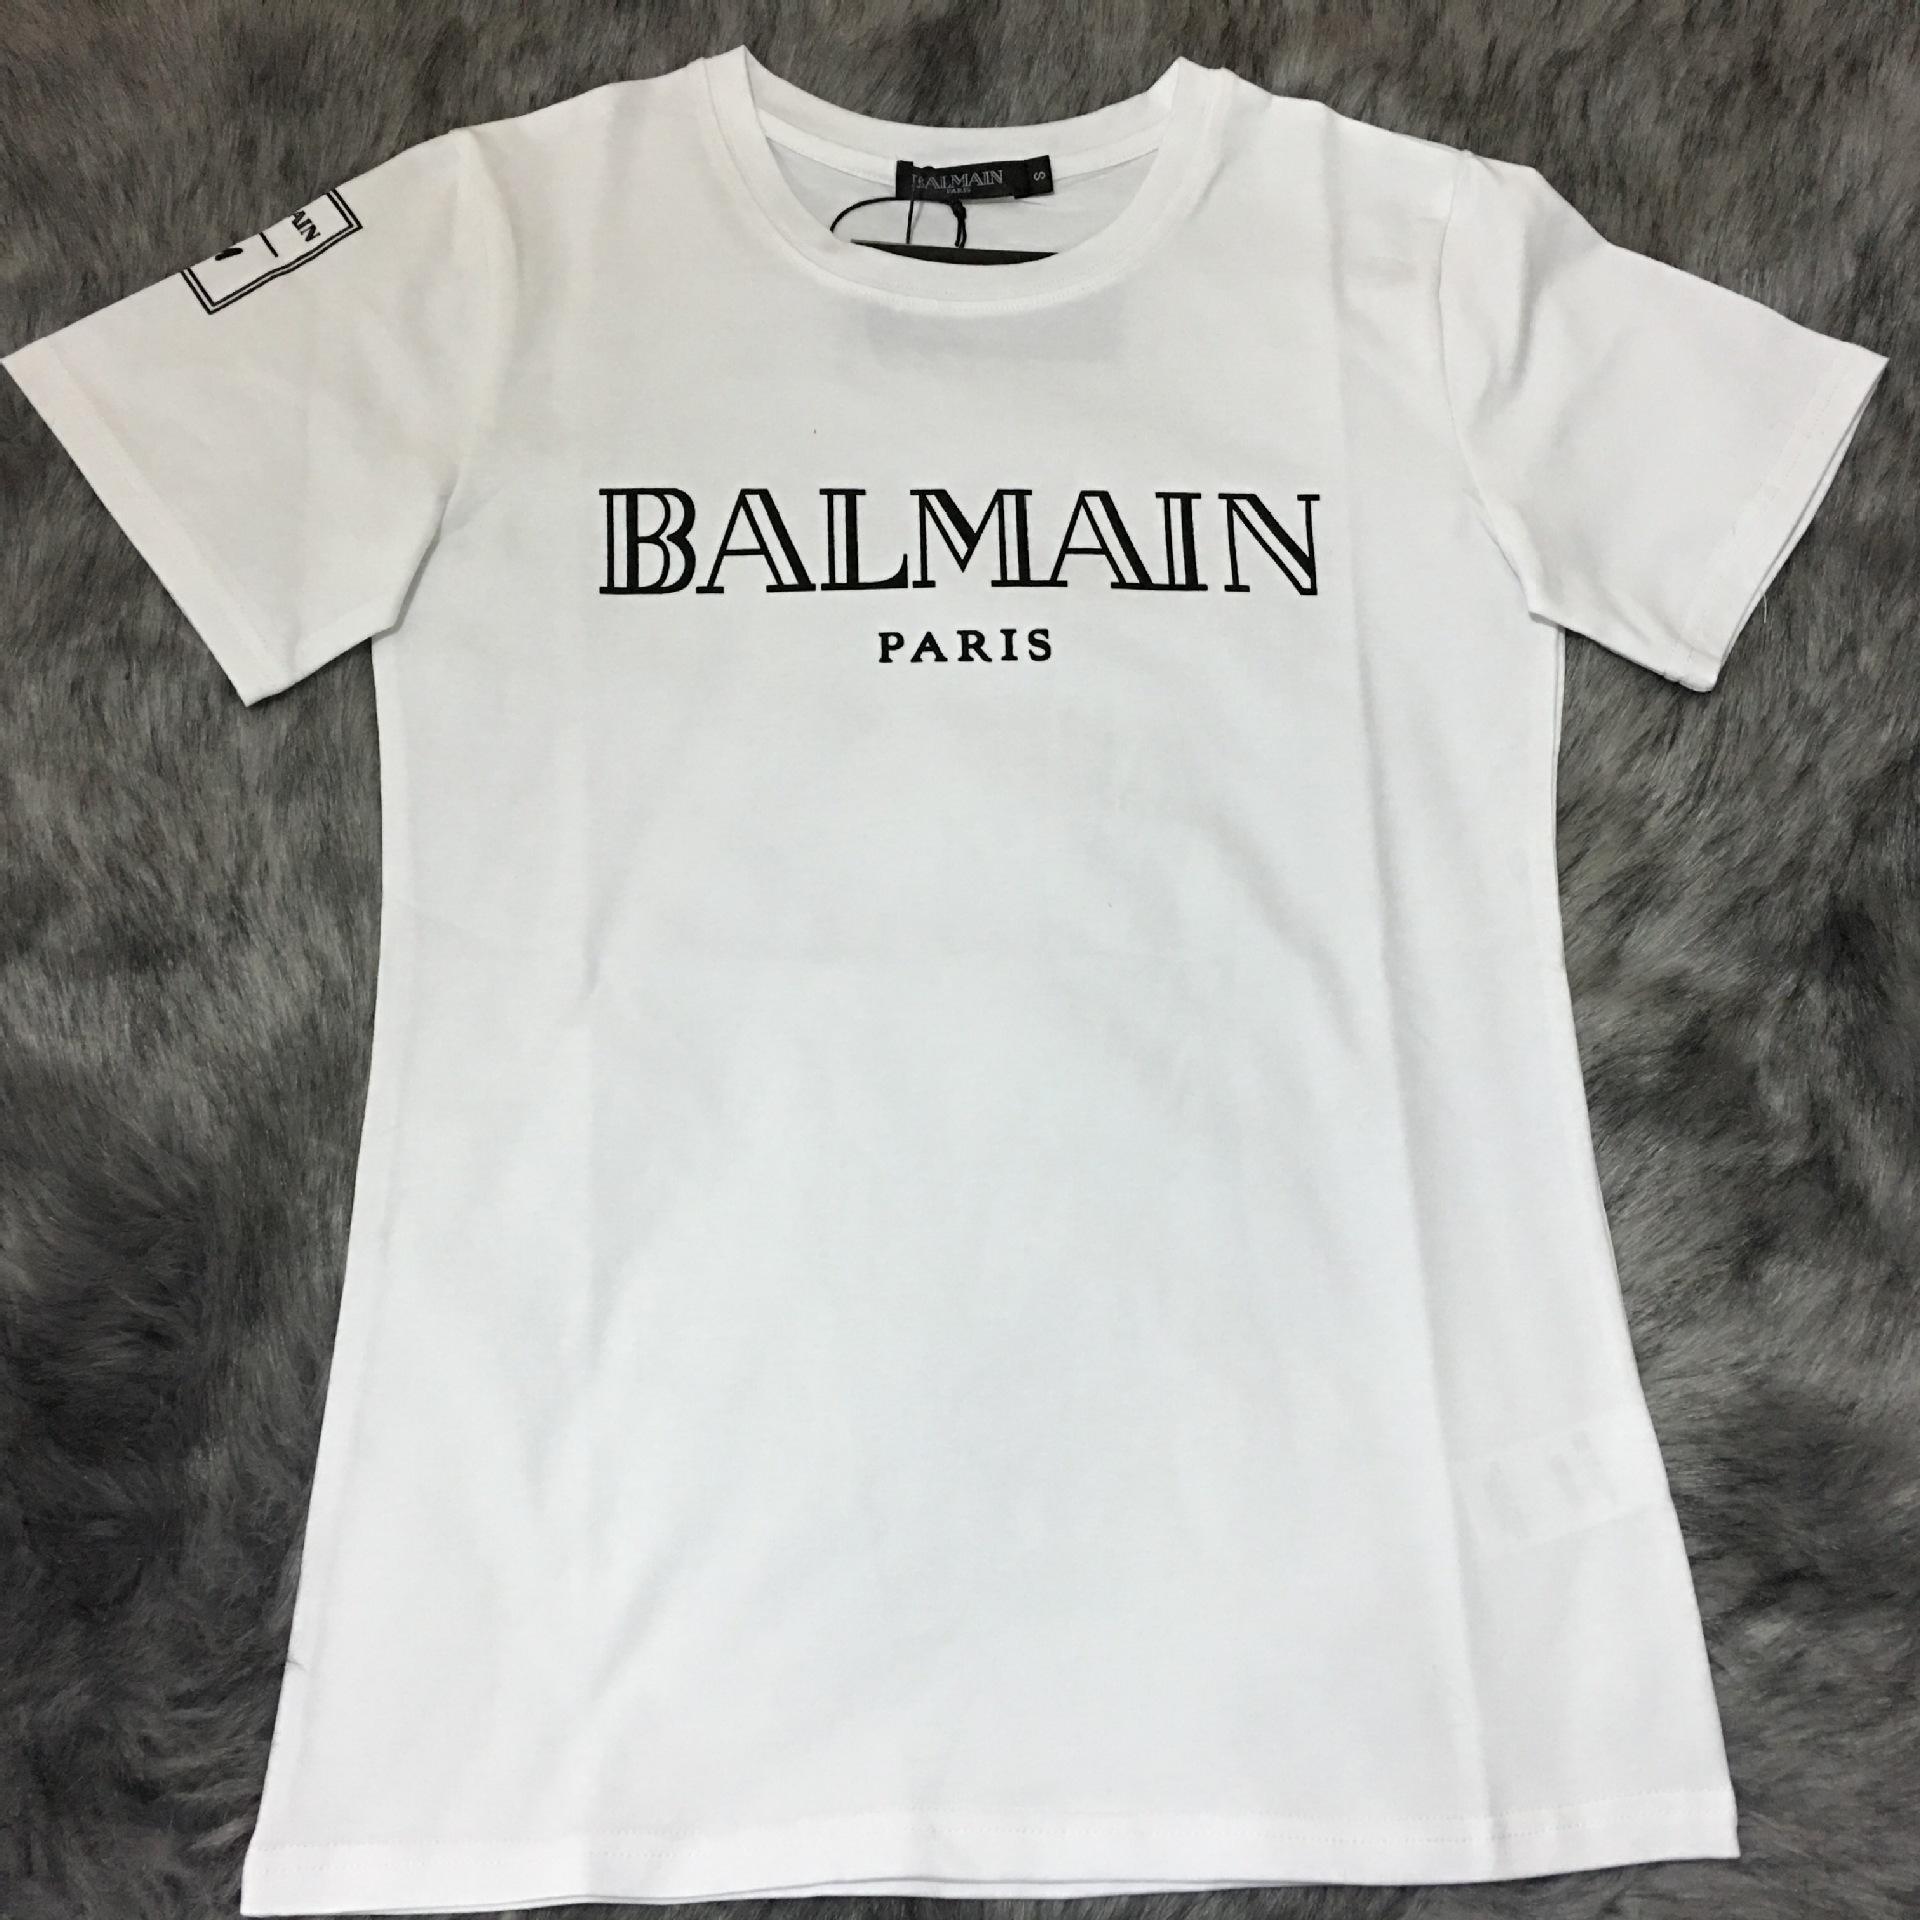 2016 new mens balmain cotton t shirt printed gold letter balmain paris xs xxl the following t. Black Bedroom Furniture Sets. Home Design Ideas